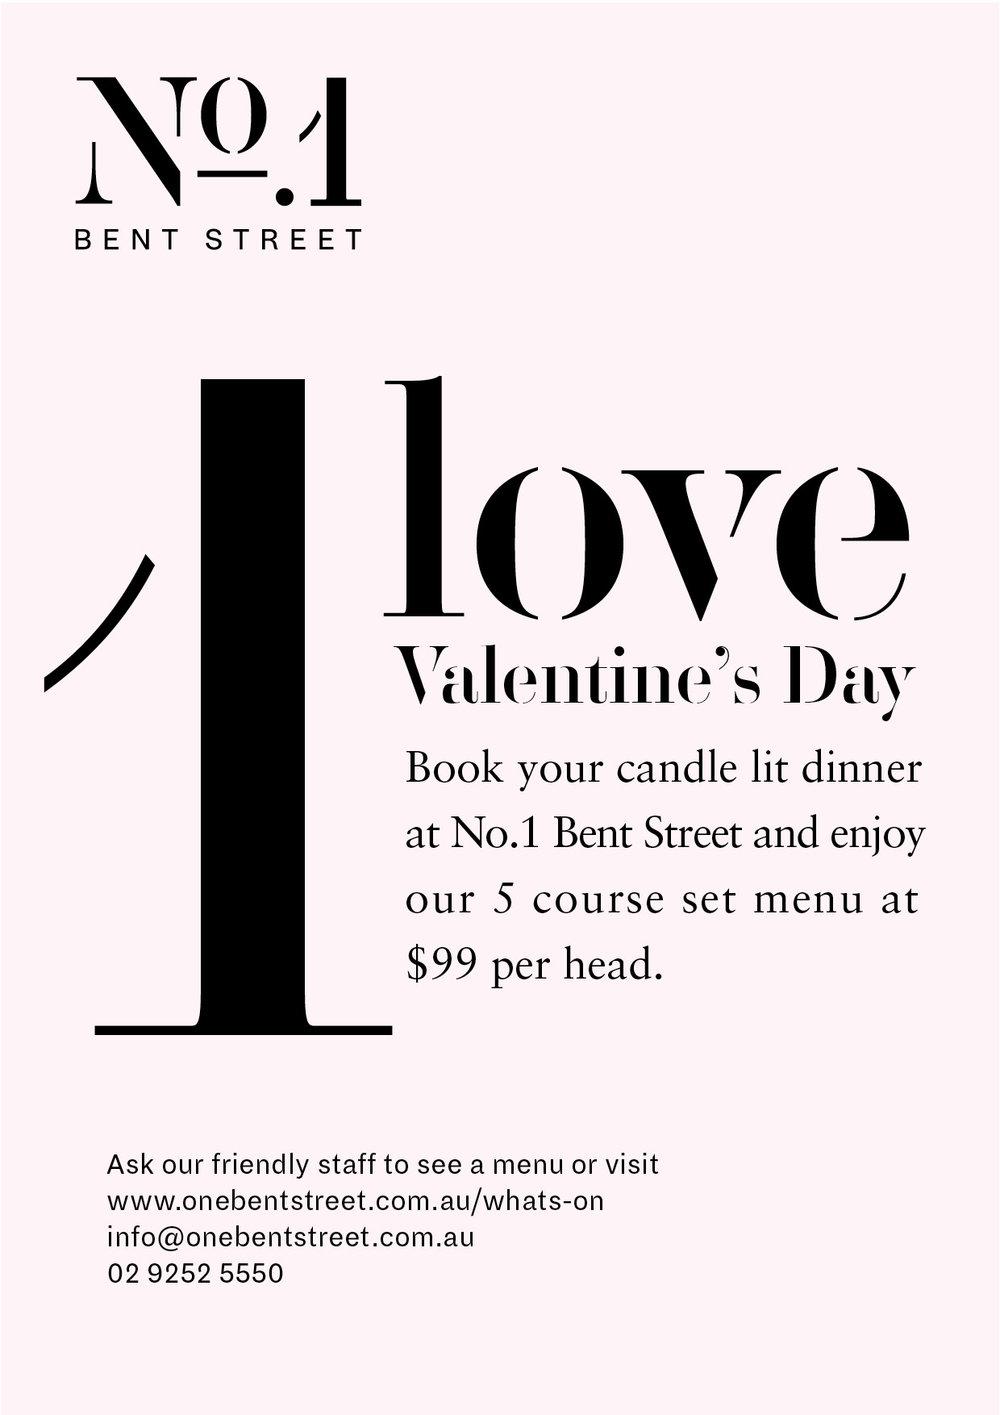 Valentines Day Menu Sydney CBD